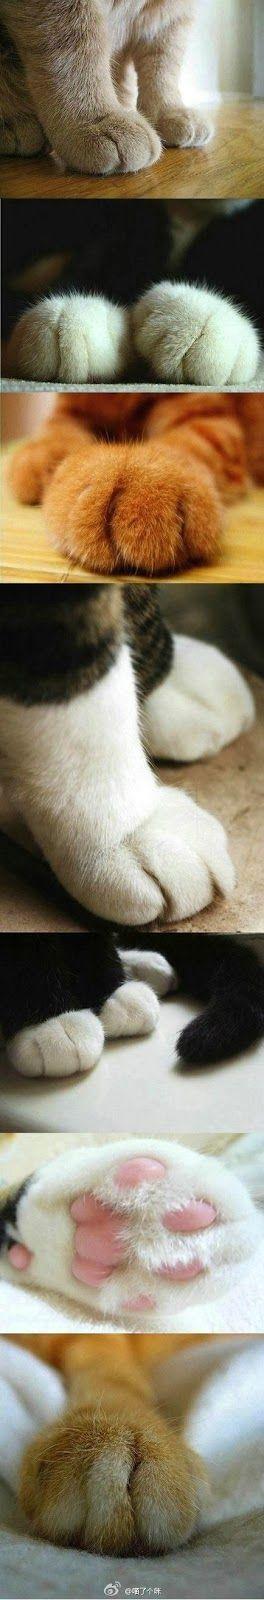 Kitteh paws... I love them!